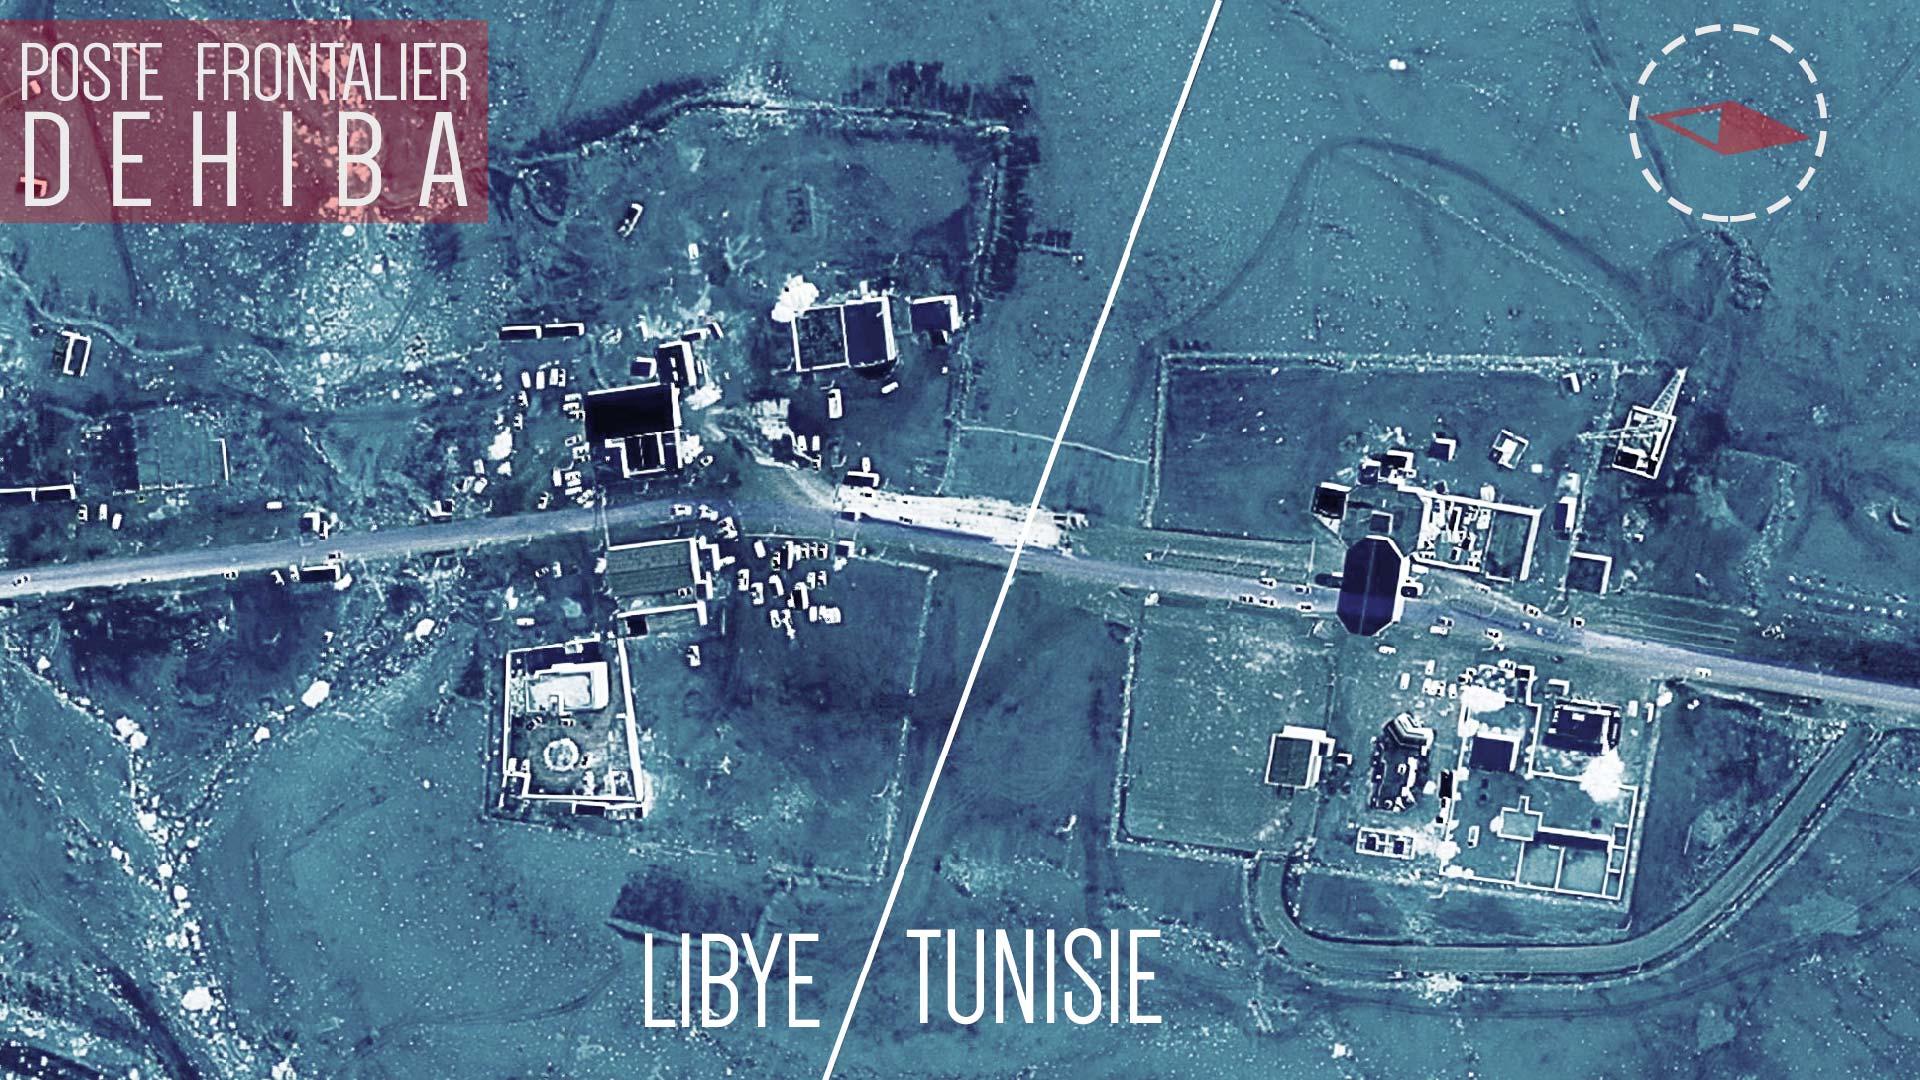 frontiere-libye-tunisie-dehiba-inkyfada